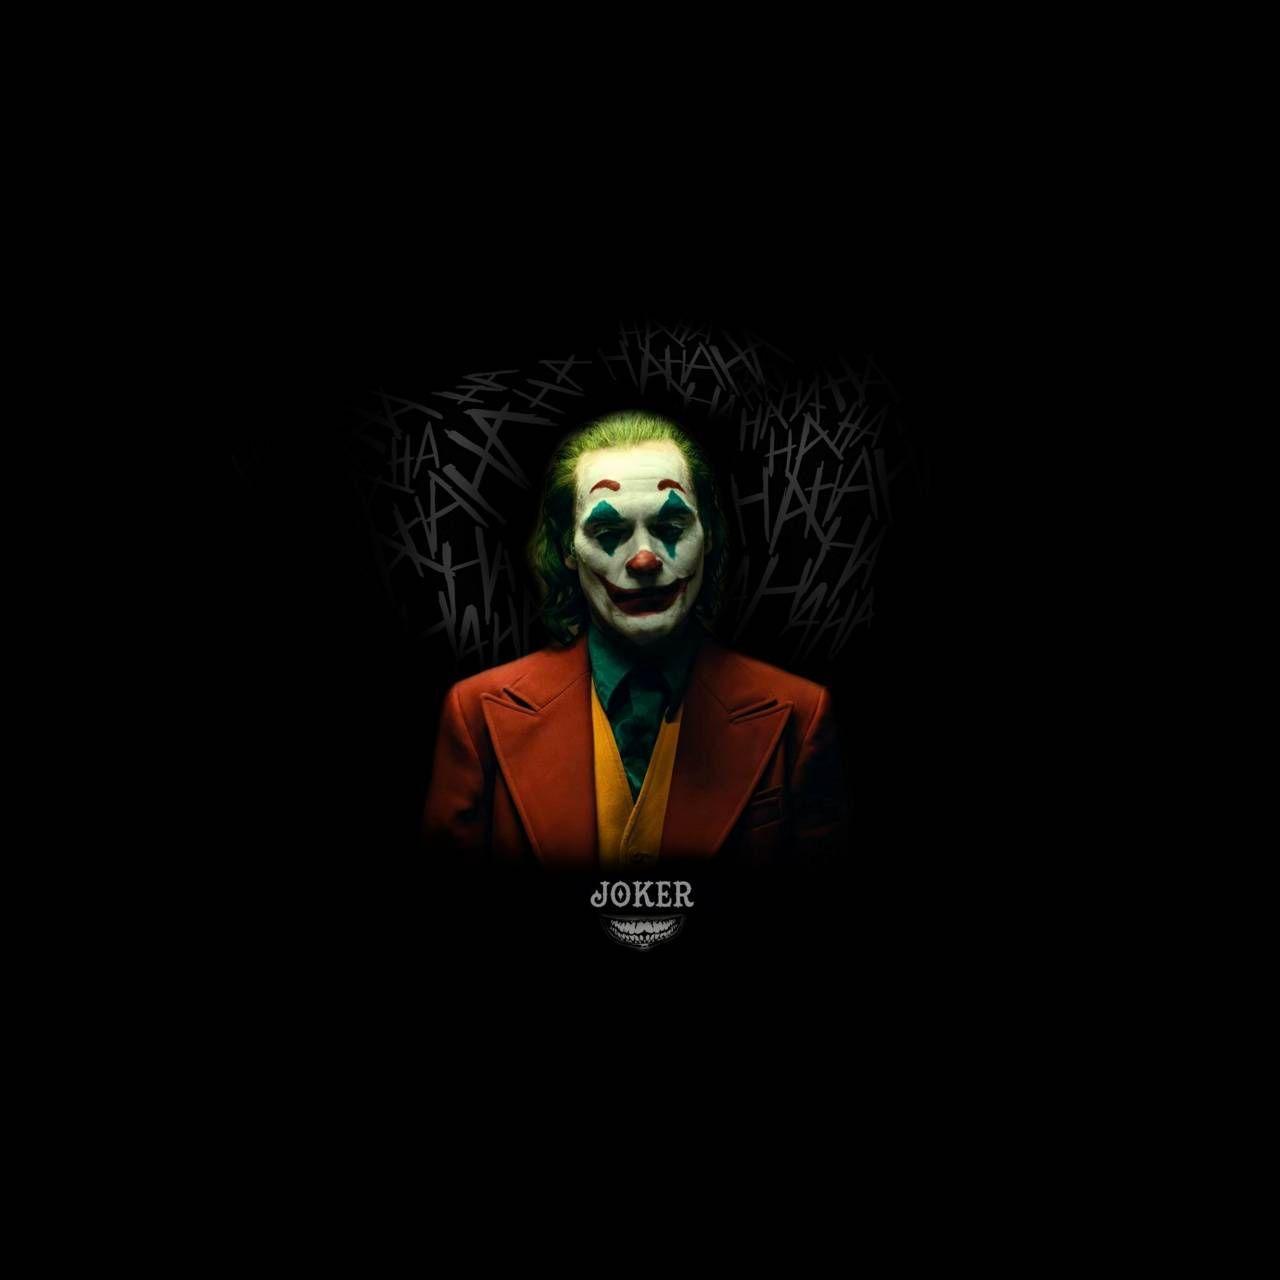 Black Joker 2019 Wallpapers Top Free Black Joker 2019 Backgrounds Wallpaperaccess